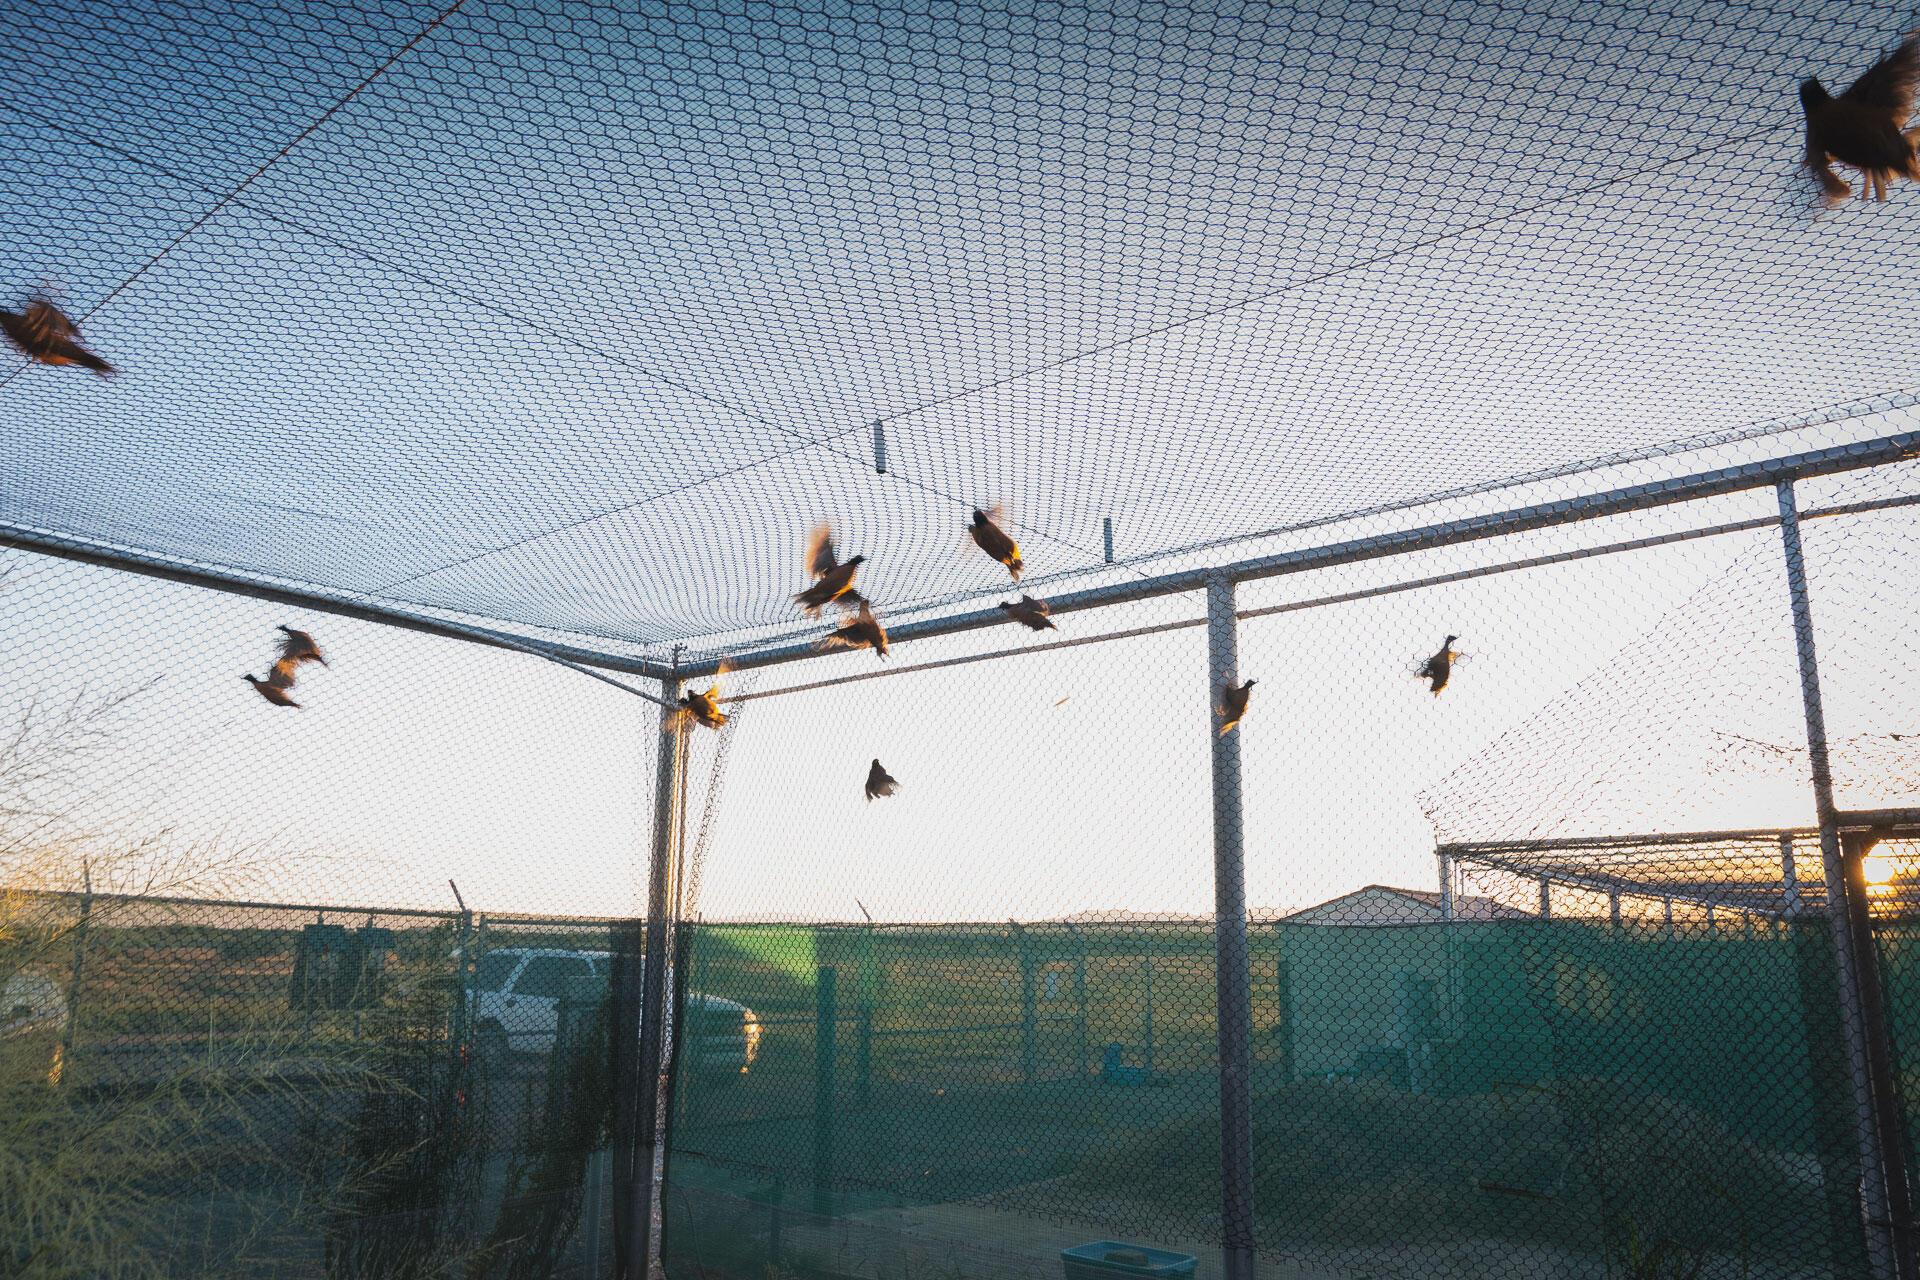 Bobwhites fly around their enclosure at Buenos Aires. Morgan Heim